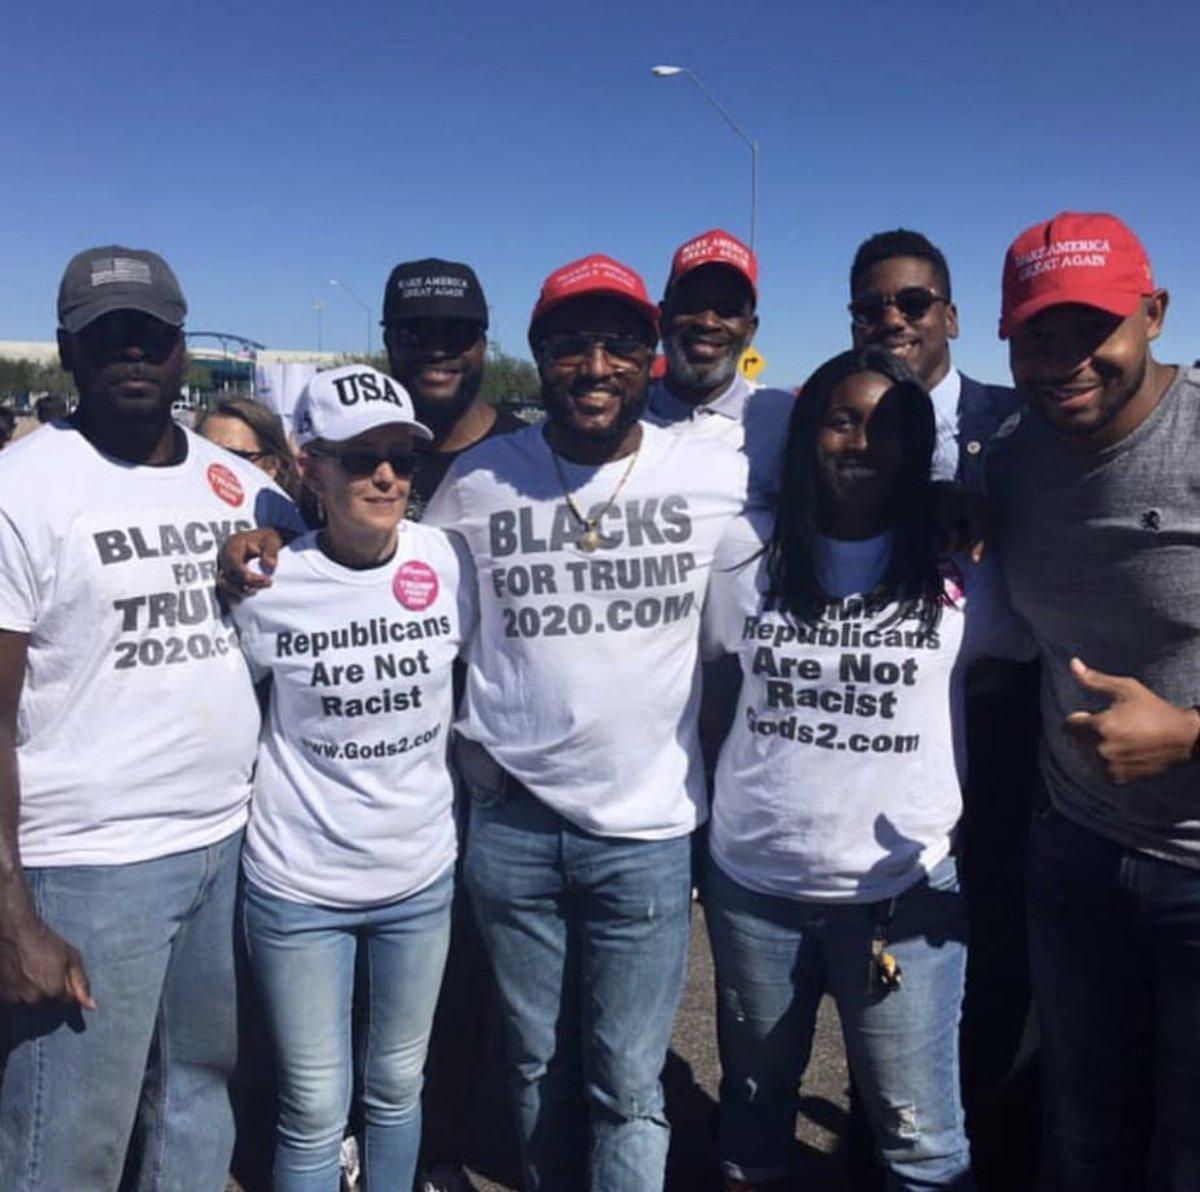 We love living in President Trump's America! 🇺🇸